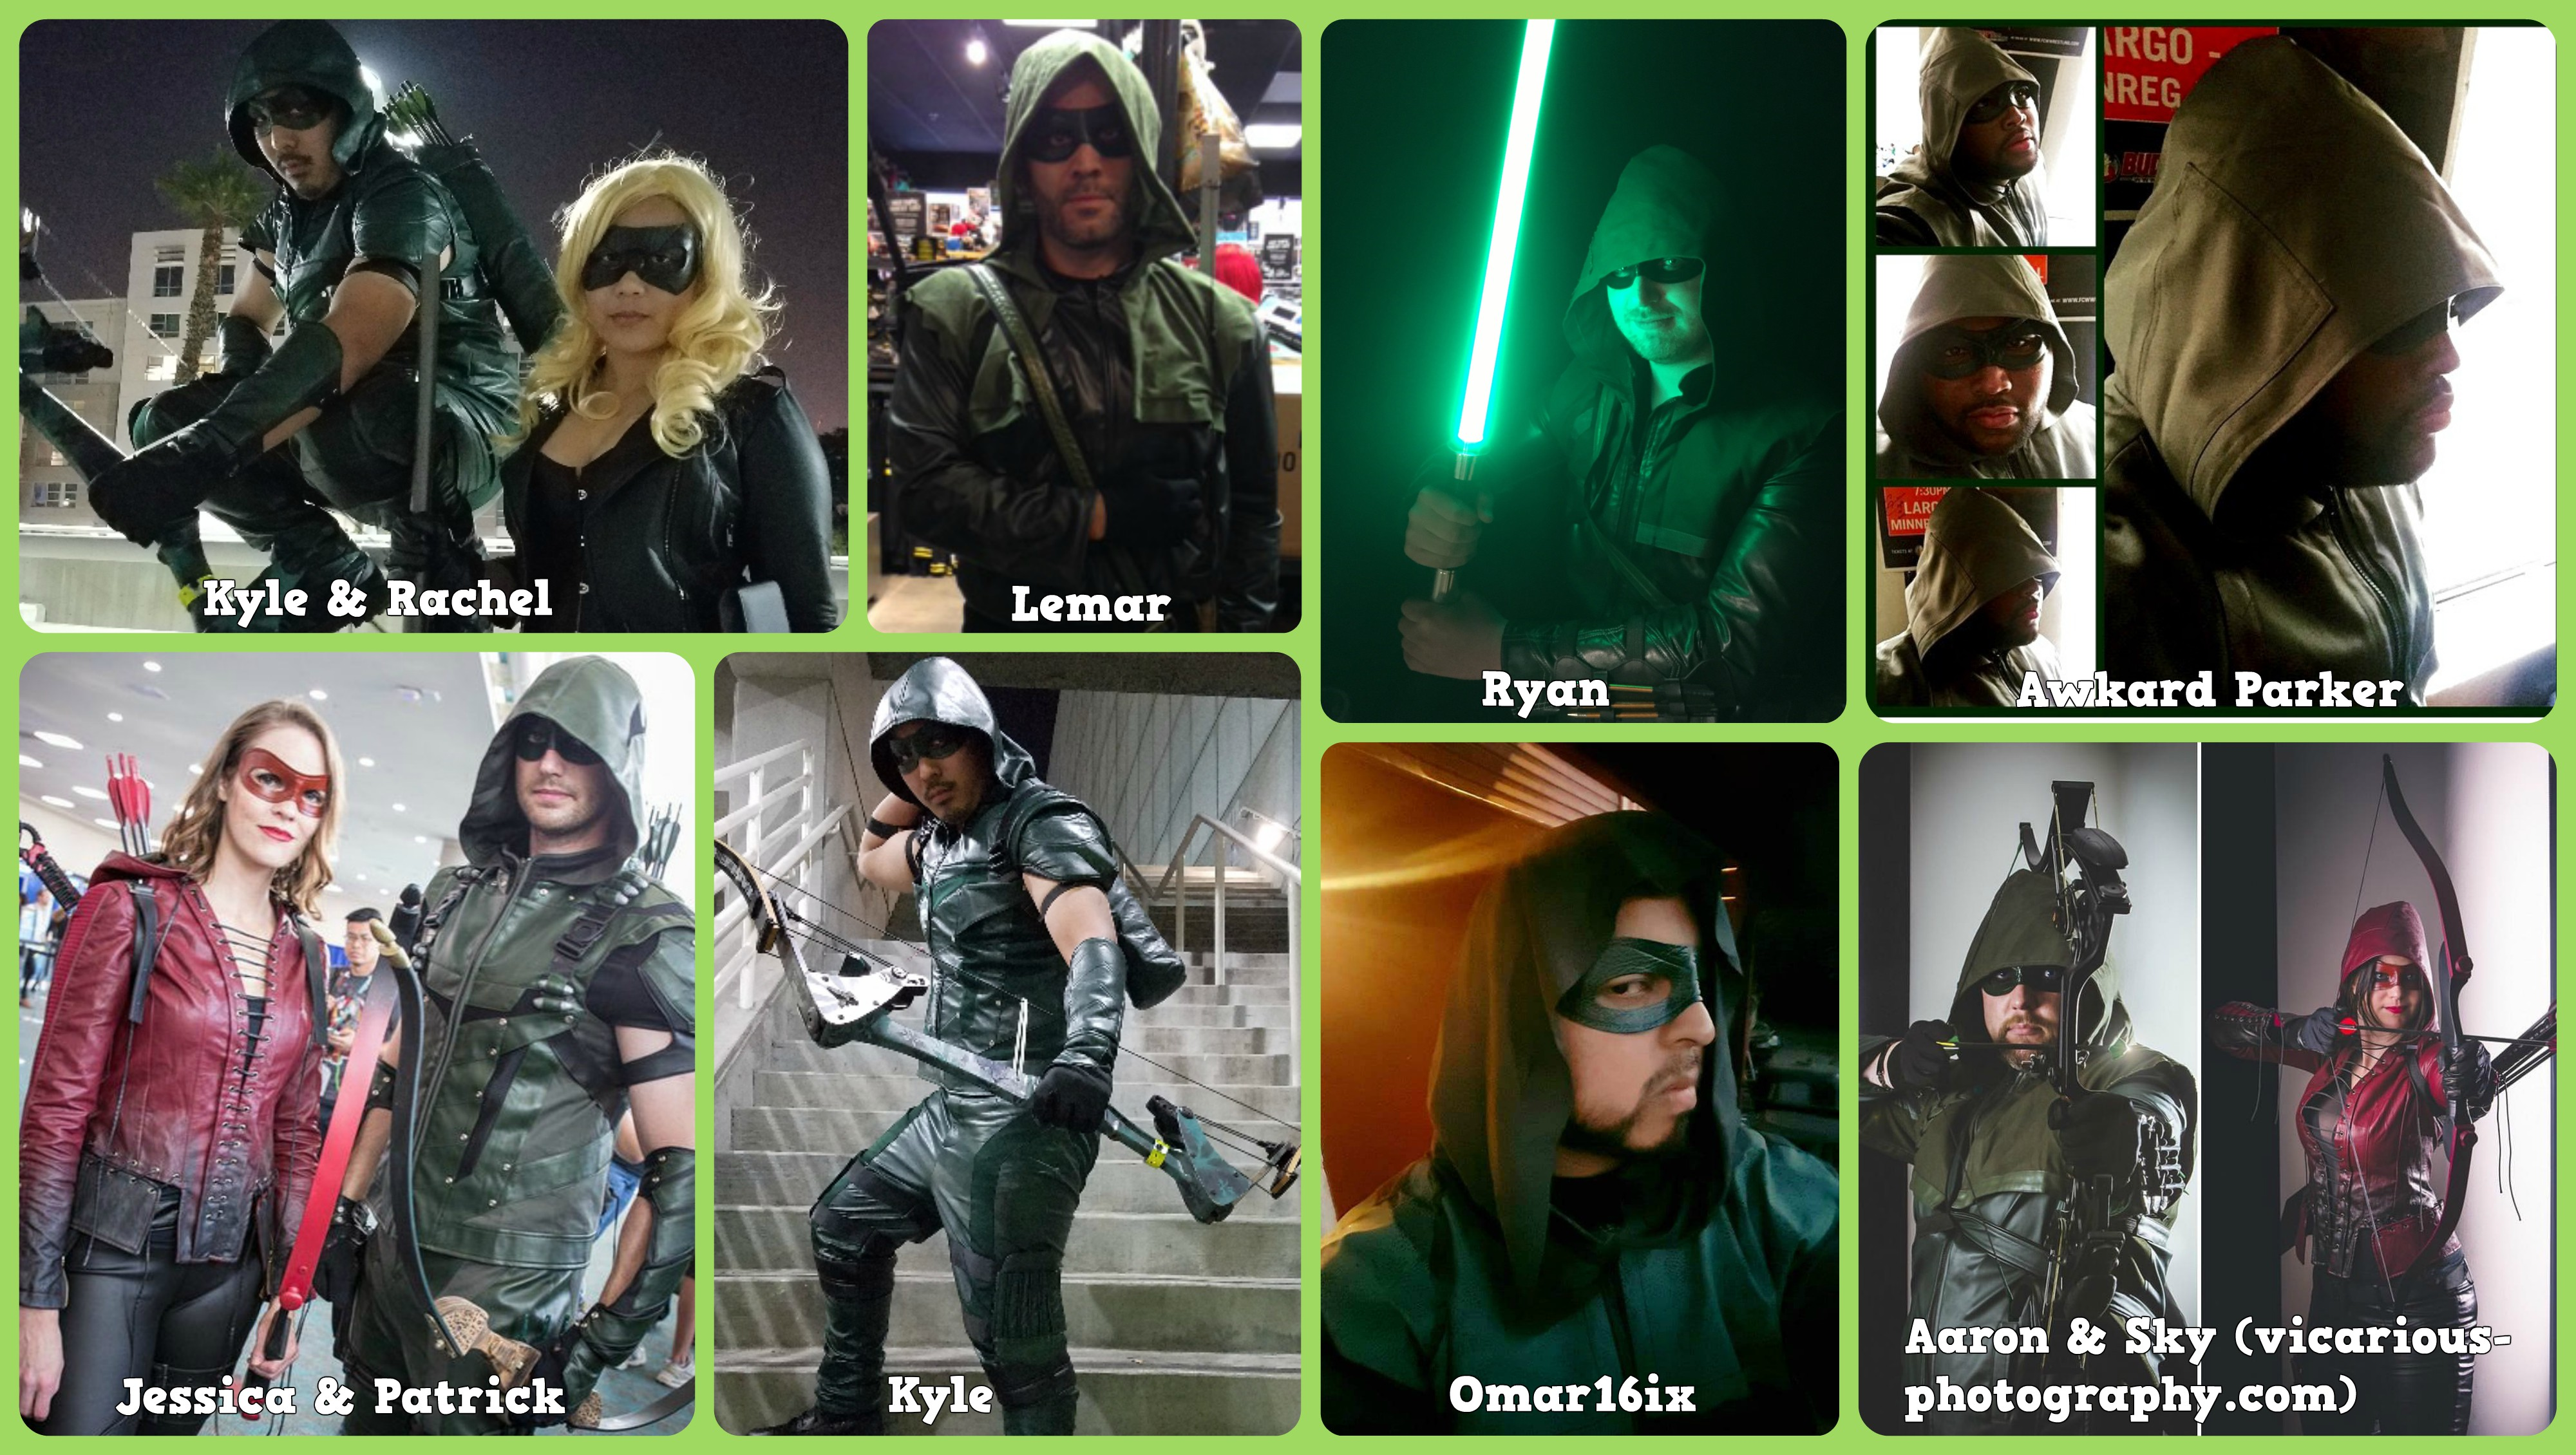 arrow-mask-cosplay-collage.jpg